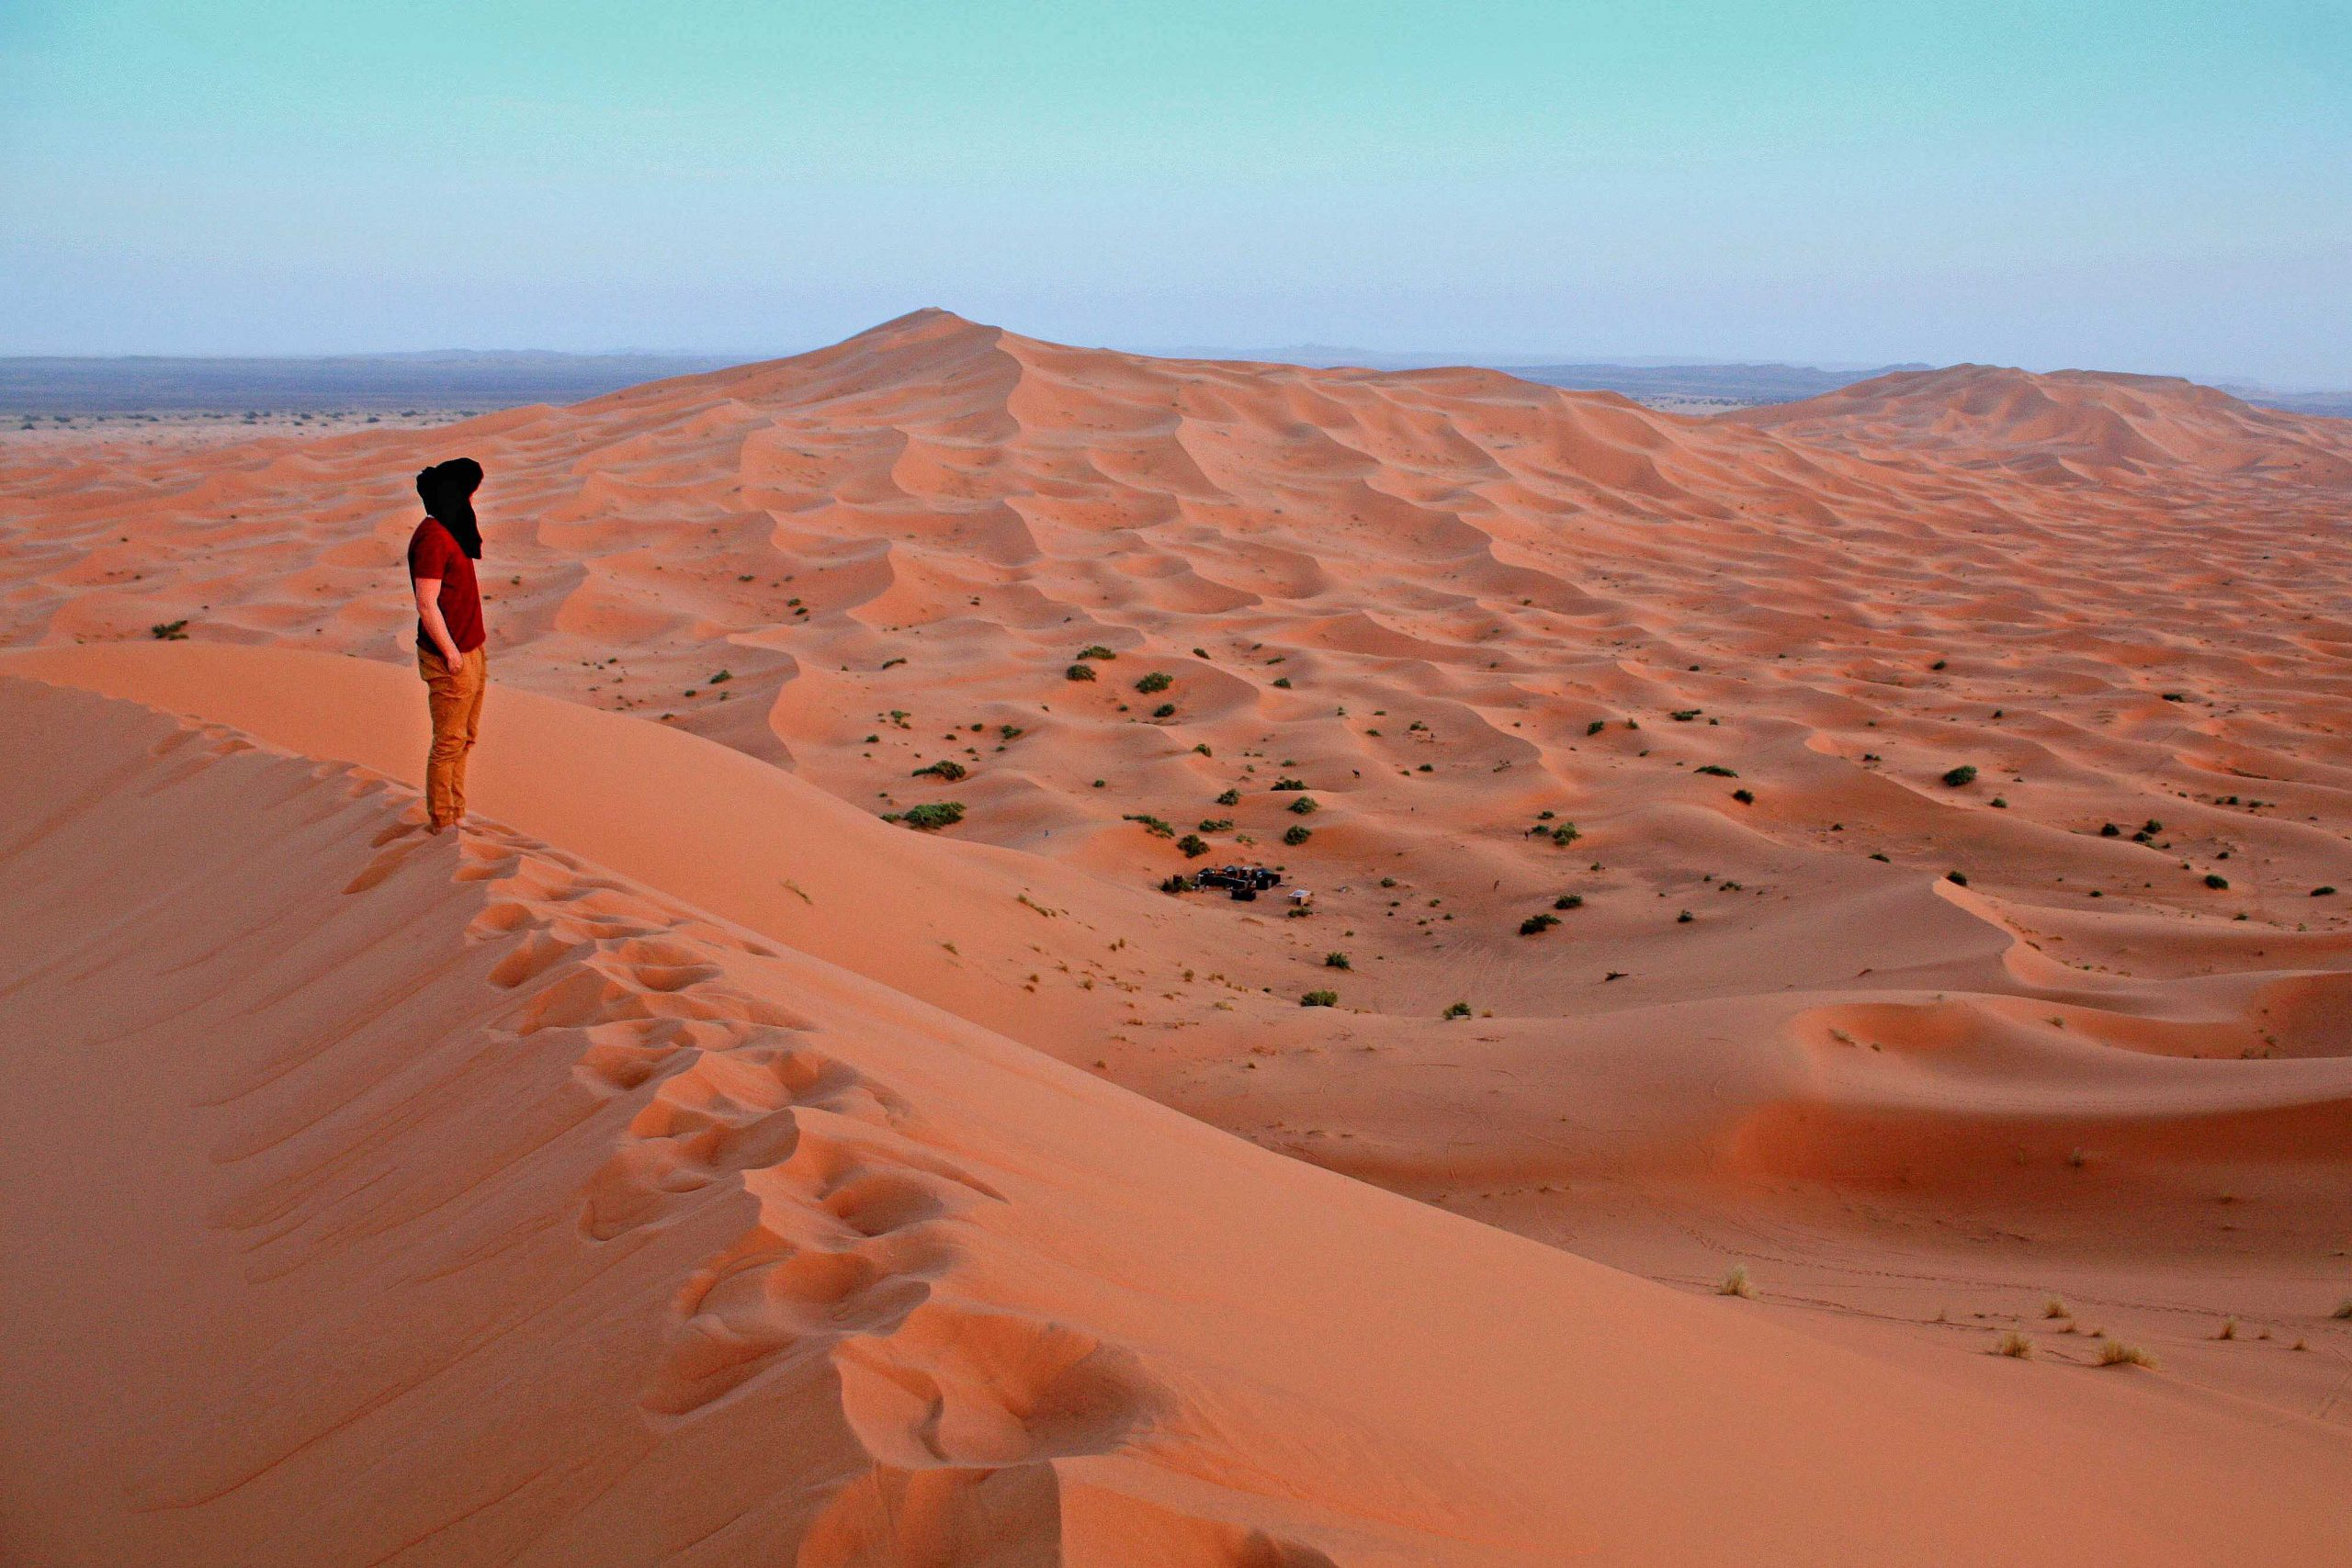 The Moroccan Sahara